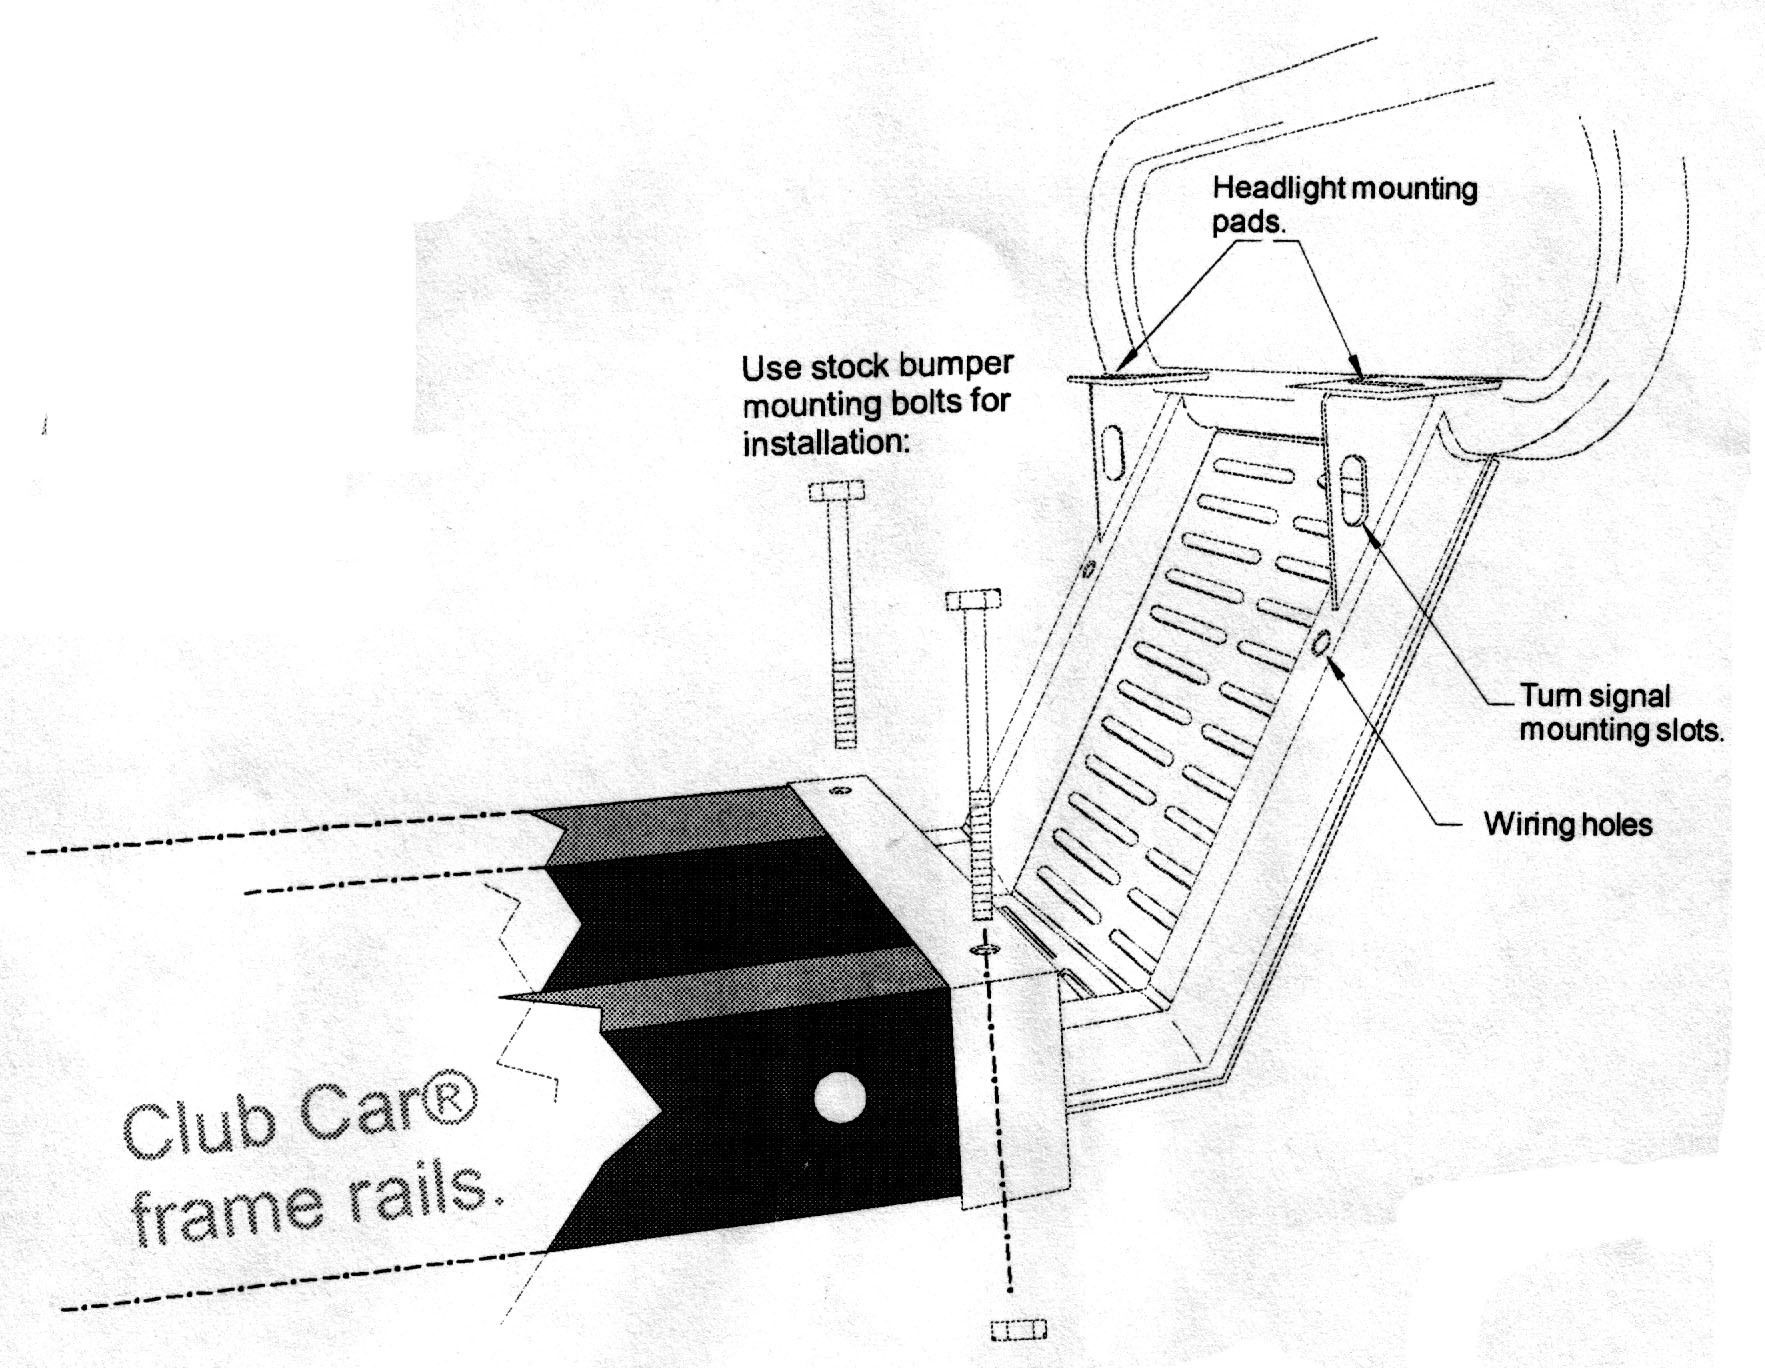 Unique Wiring Diagram 2007 Club Car Precedent | Car frames ...